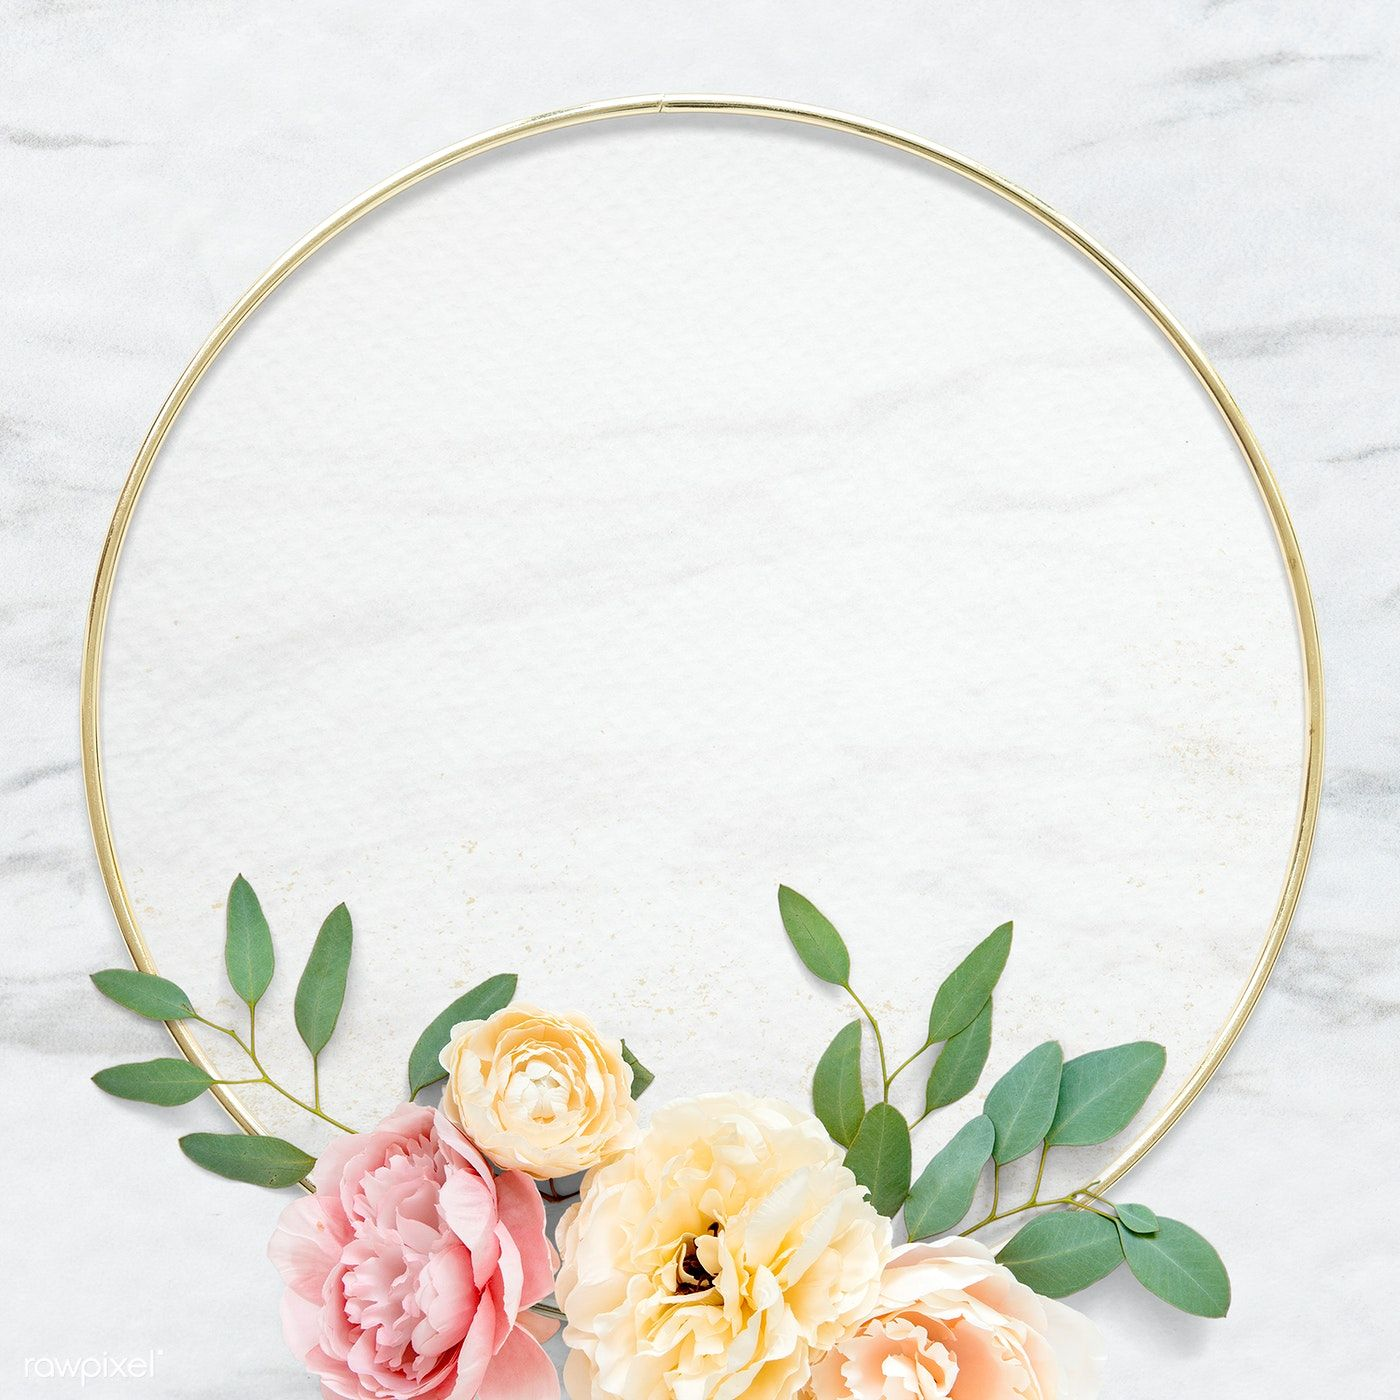 Download premium psd of Golden round floral frame design